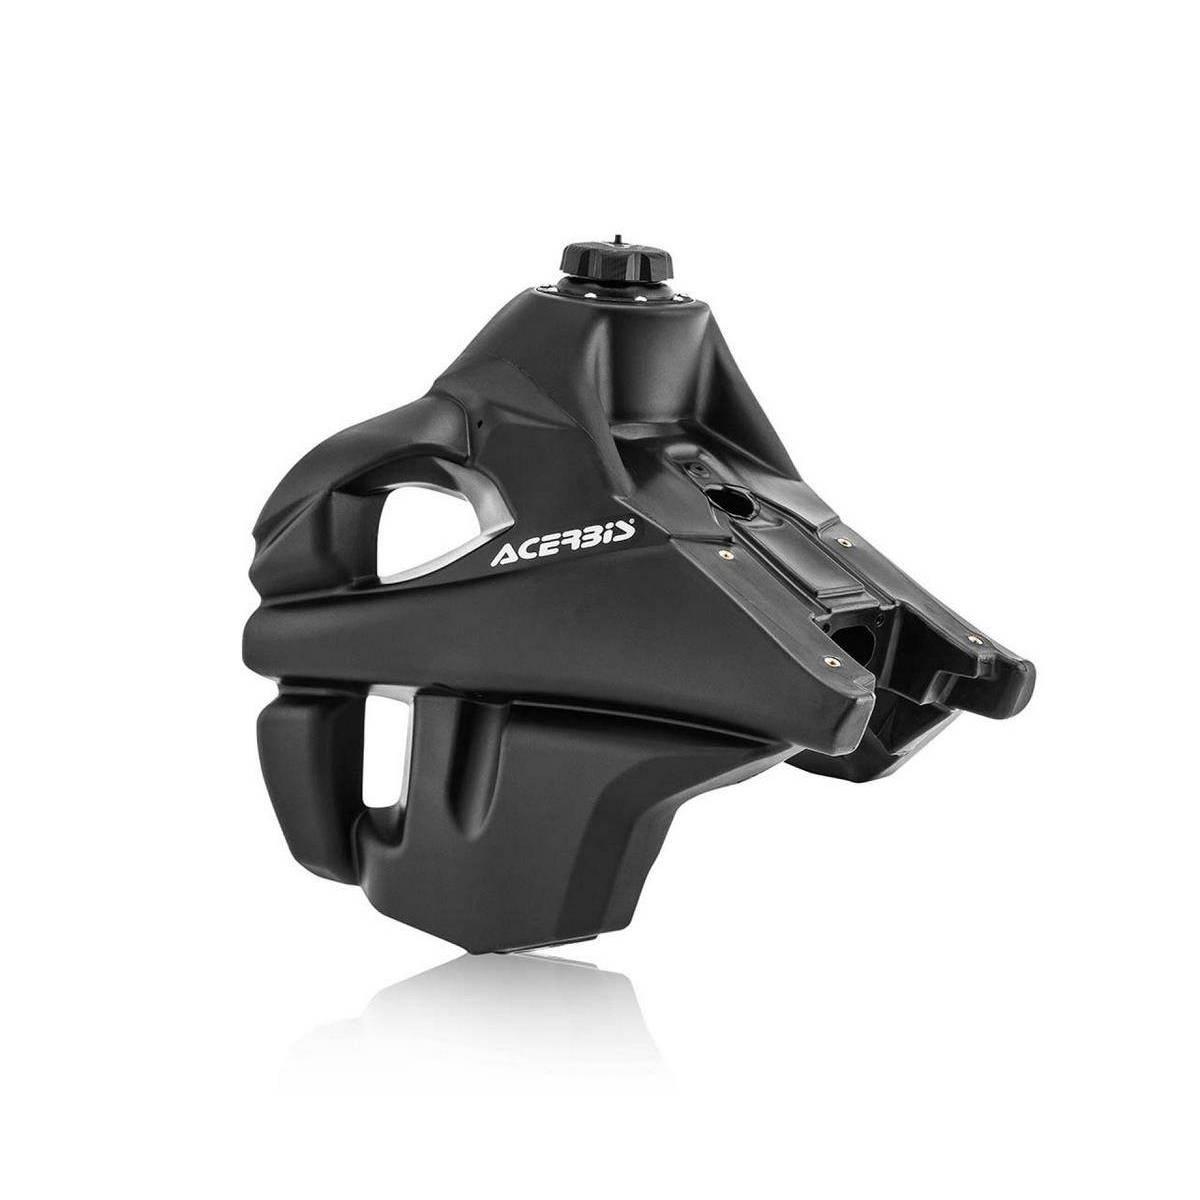 Depósito Acerbis KTM EXCF 250/350/450/500 17-19 SXF 250/350/450 16-18 15Litros NEGRO